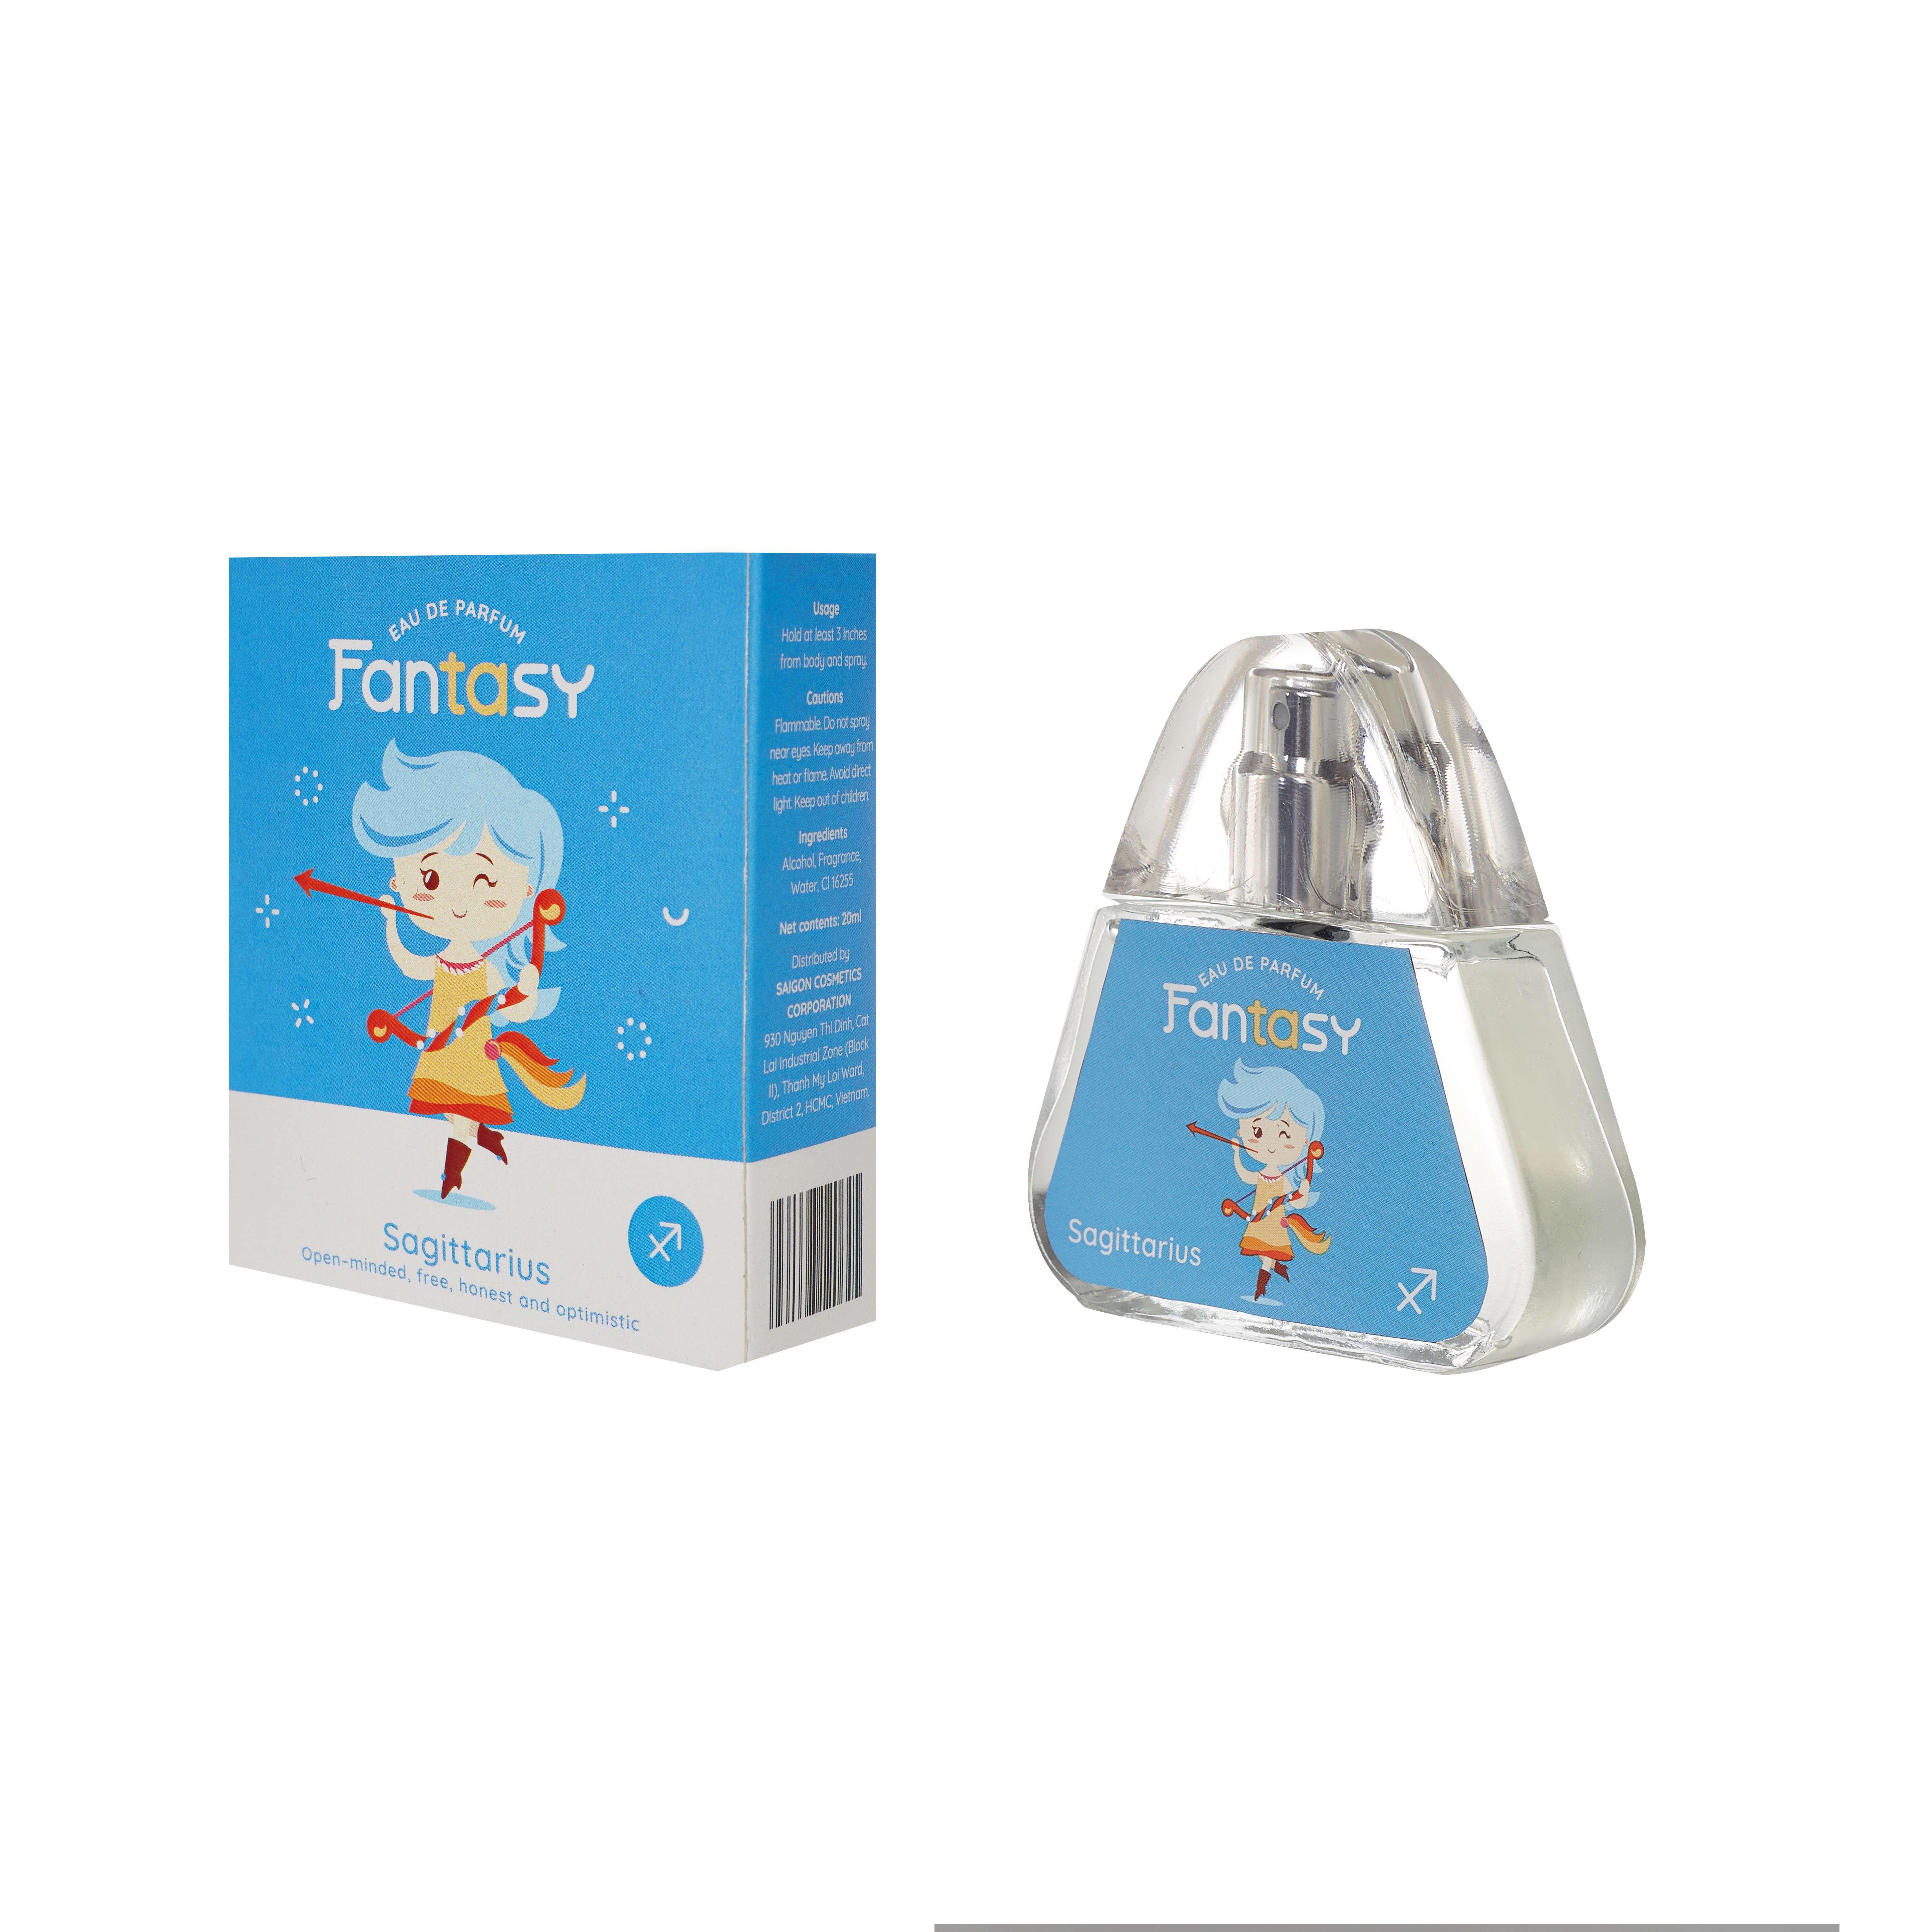 fantasy-product-main-image